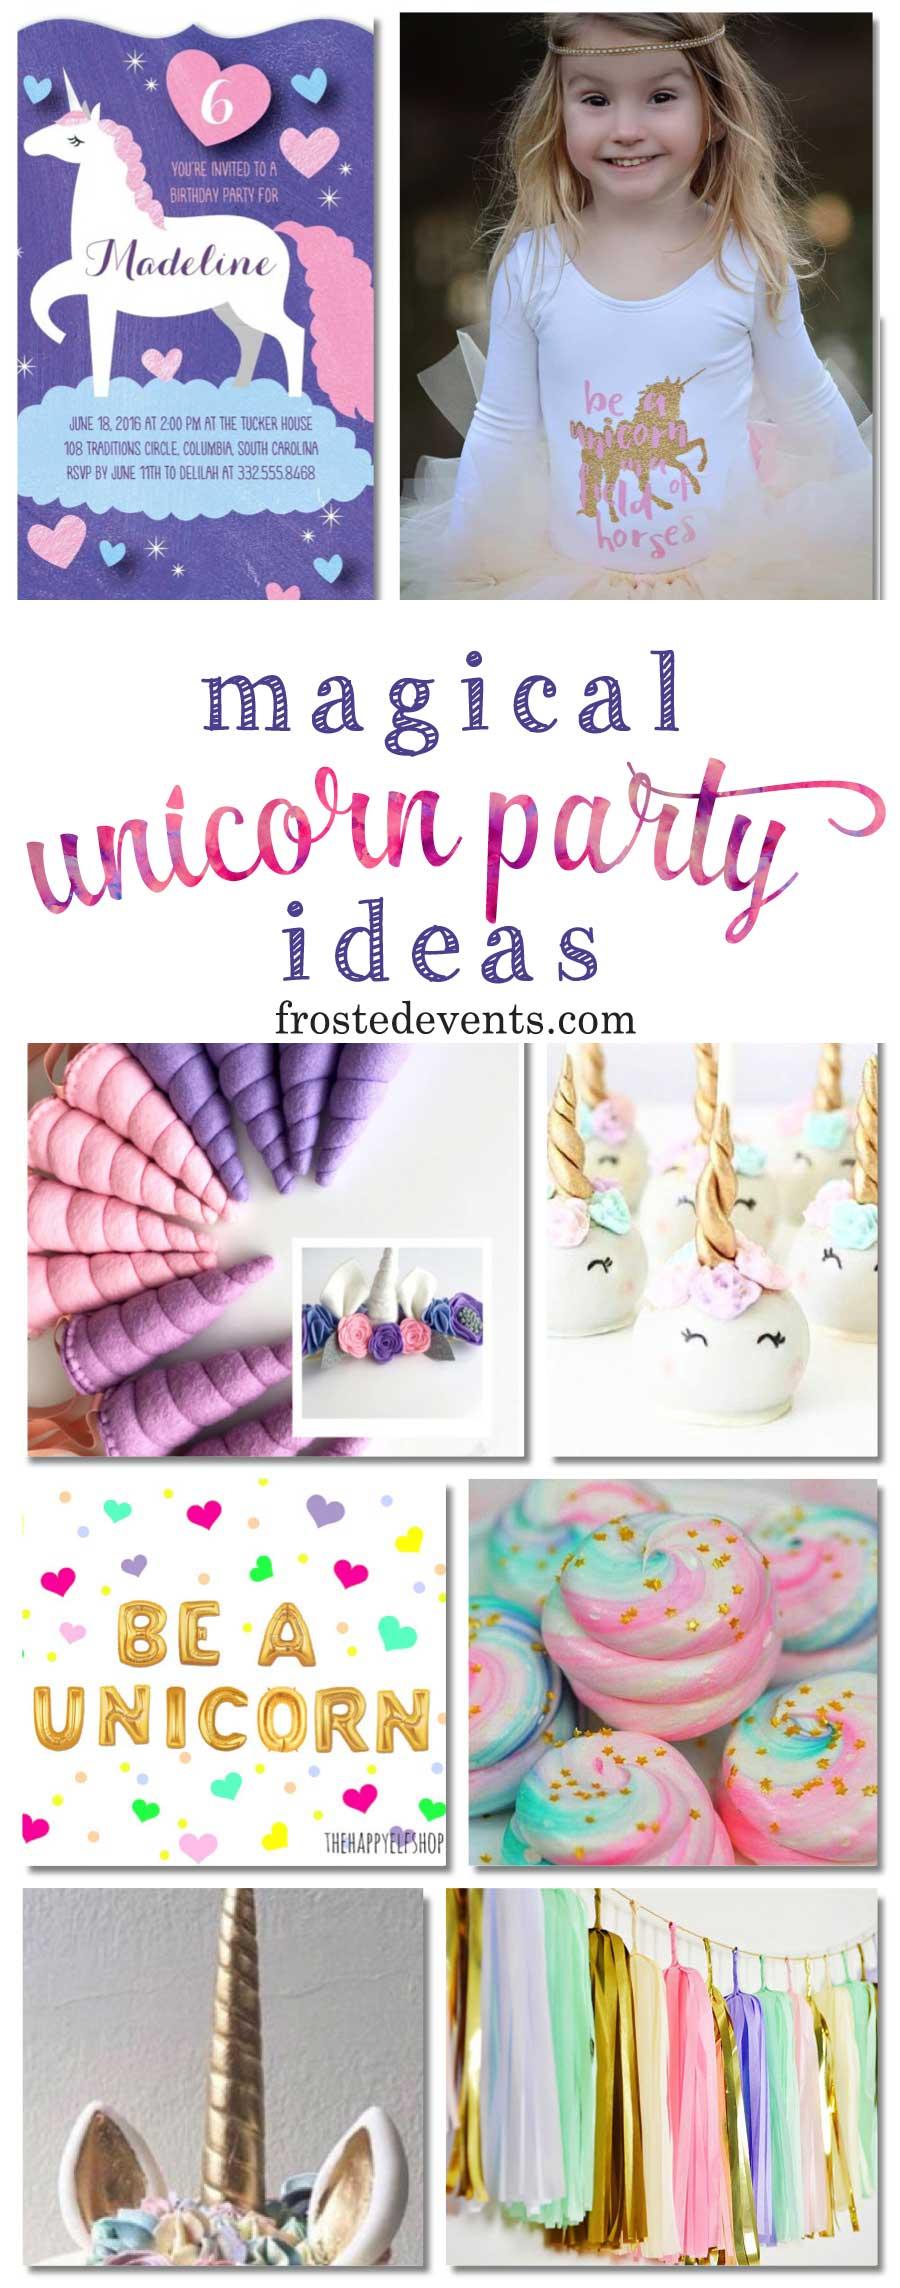 Unicorn Party Decorations and Unicorn Birthday Party Ideas